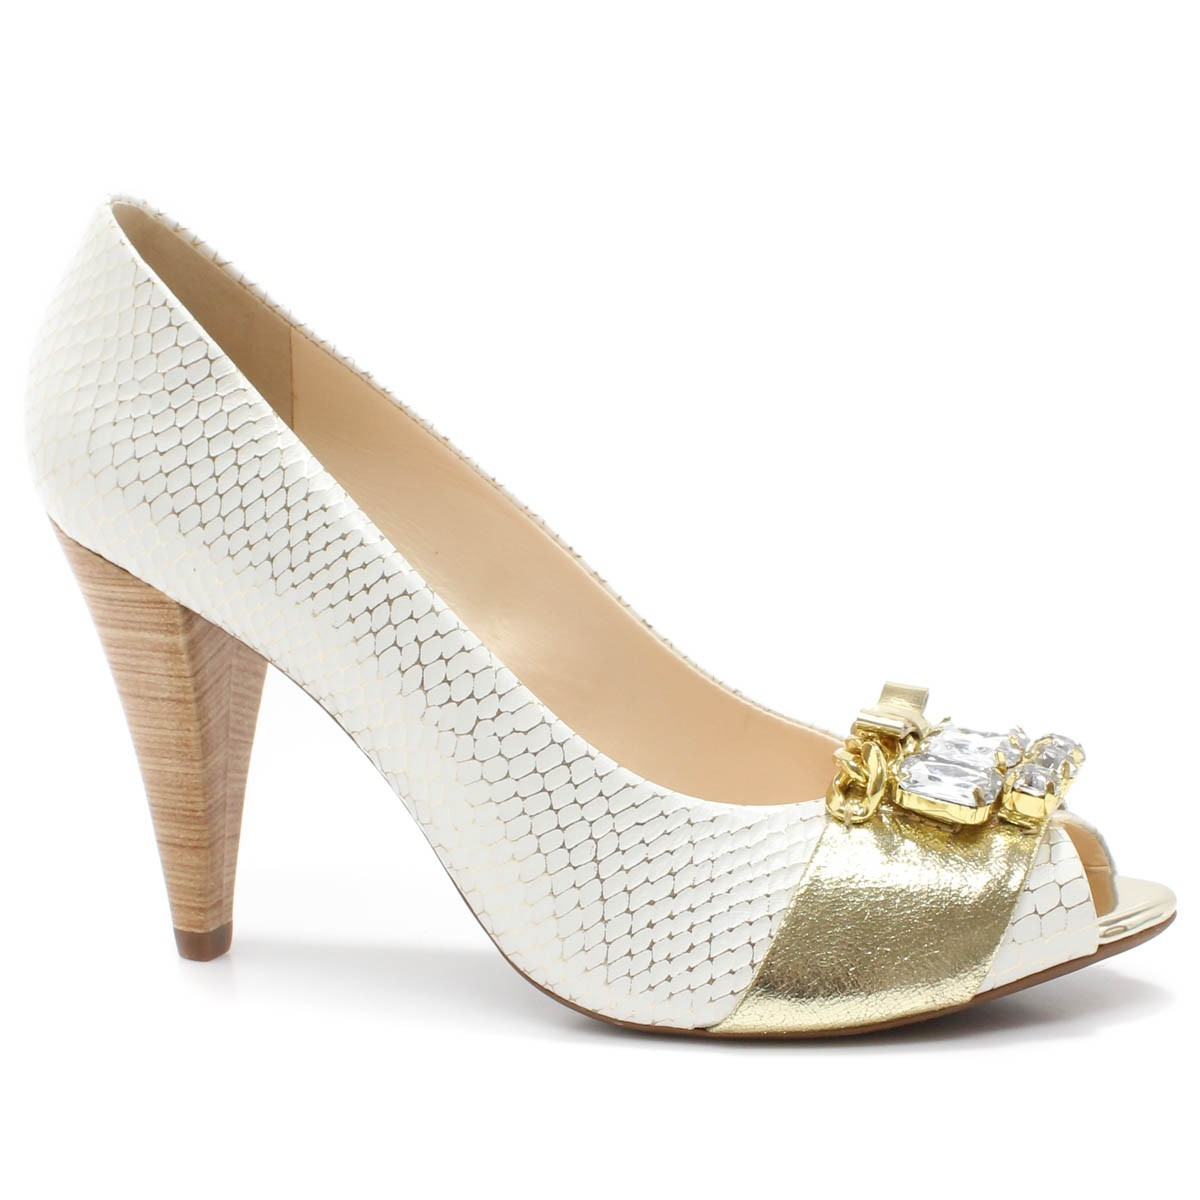 42ef217f05 Sapato Peep Toe Loucos e Santos L303340 Salto Alto - Off White ...